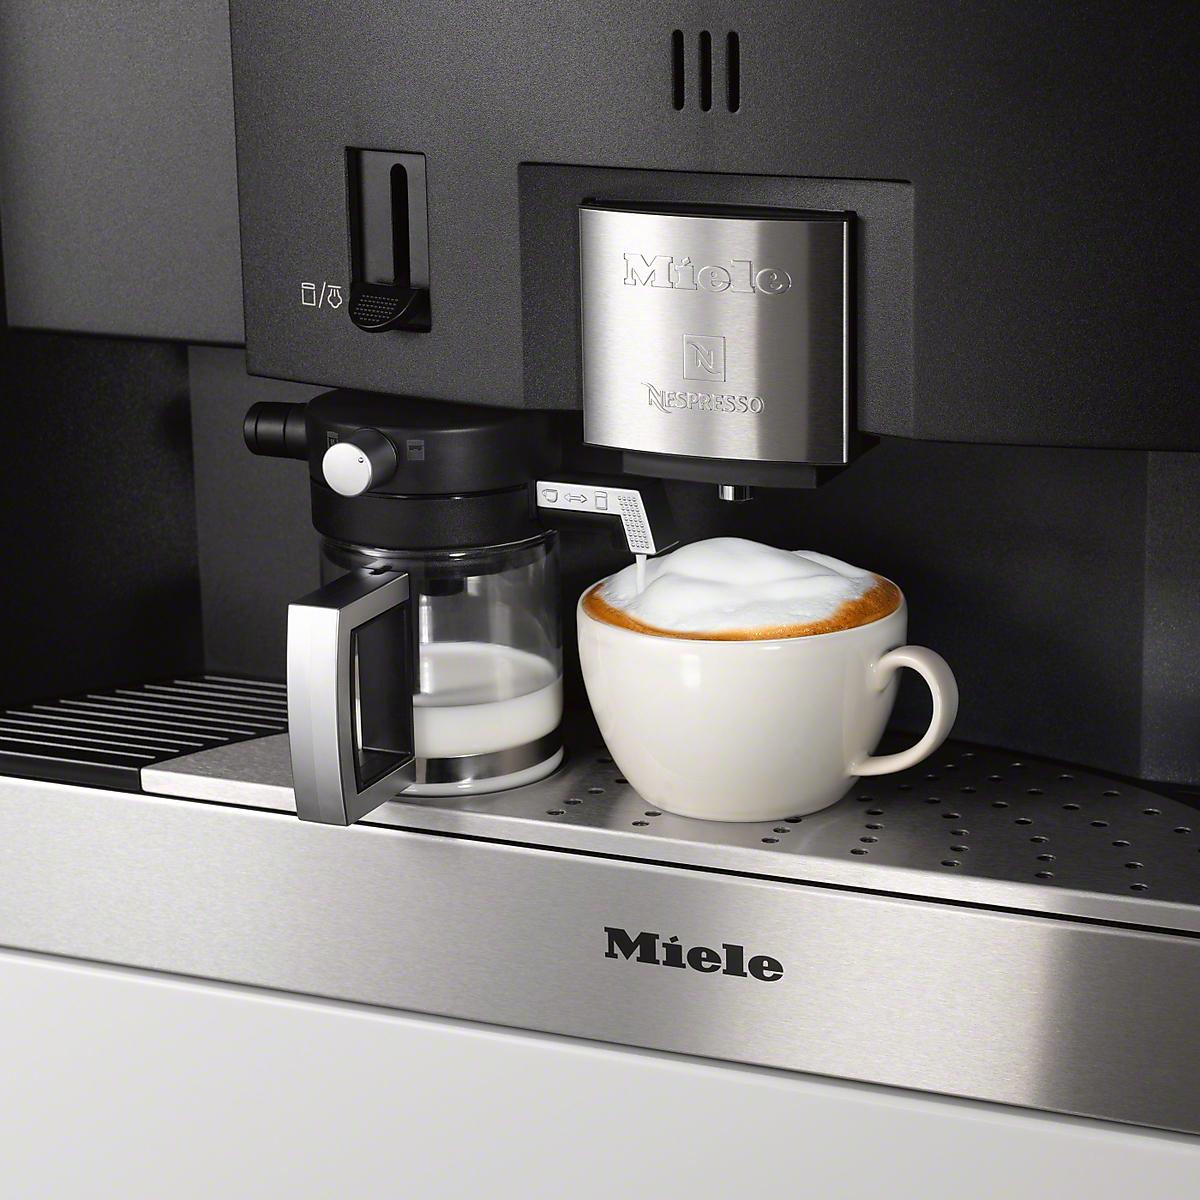 Miele ger teausstattung cvc cappuccinatore for Miele de service